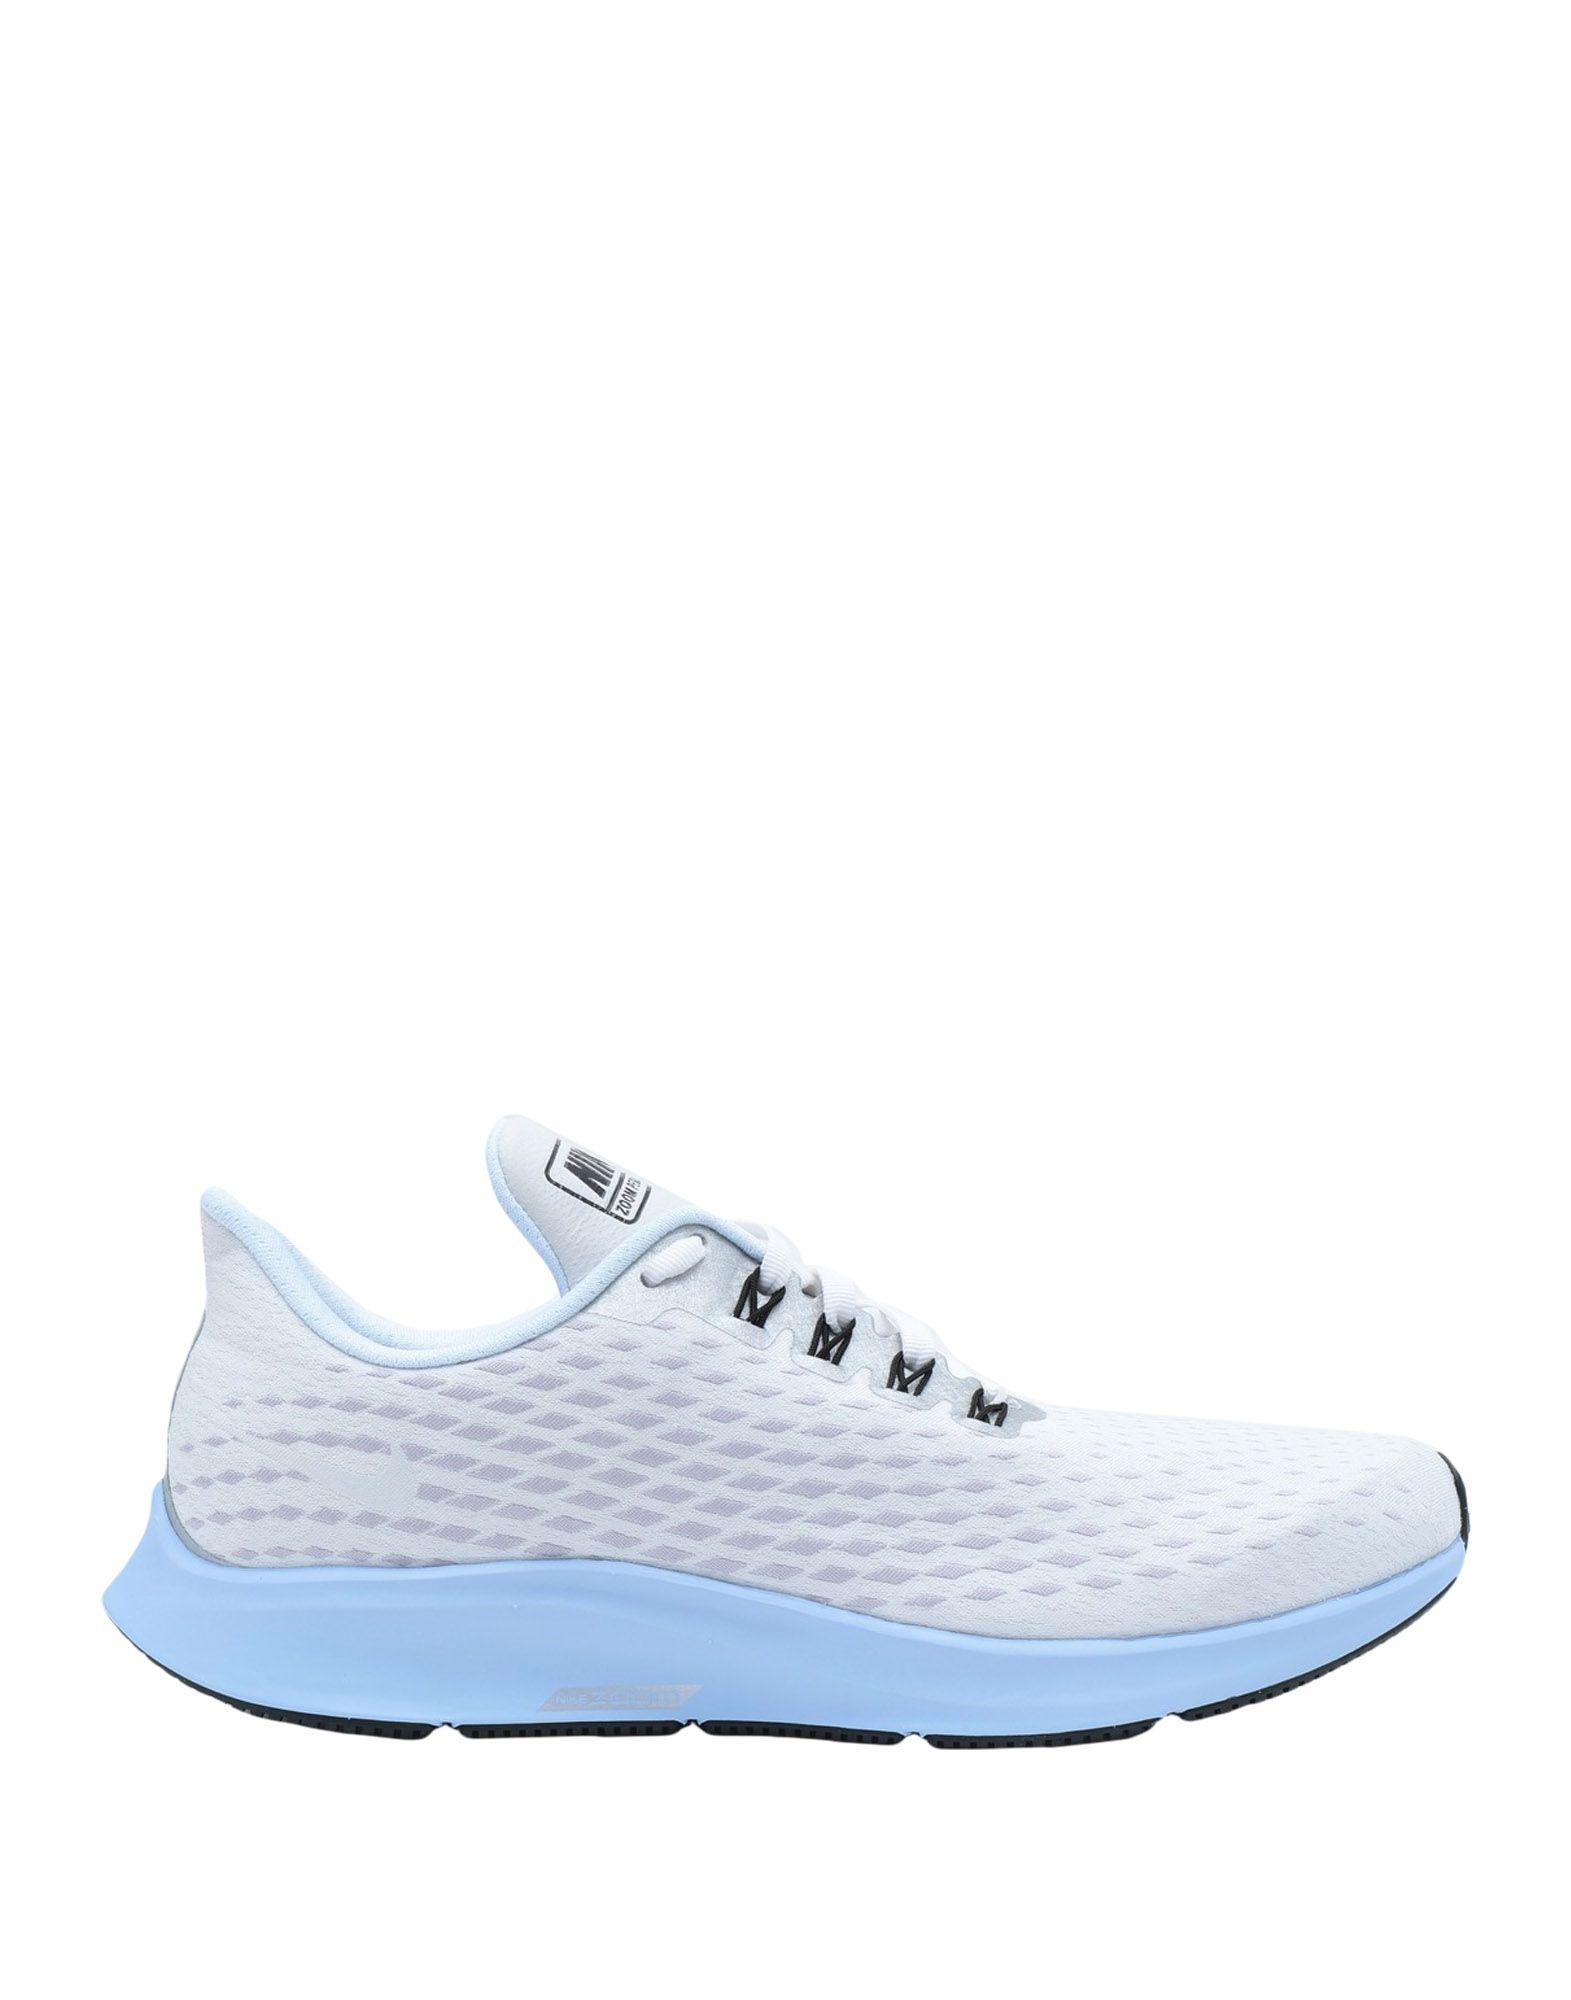 Turnschuhe Nike Air Zoom Pegasus 35 Premium - damen - 11653918RW